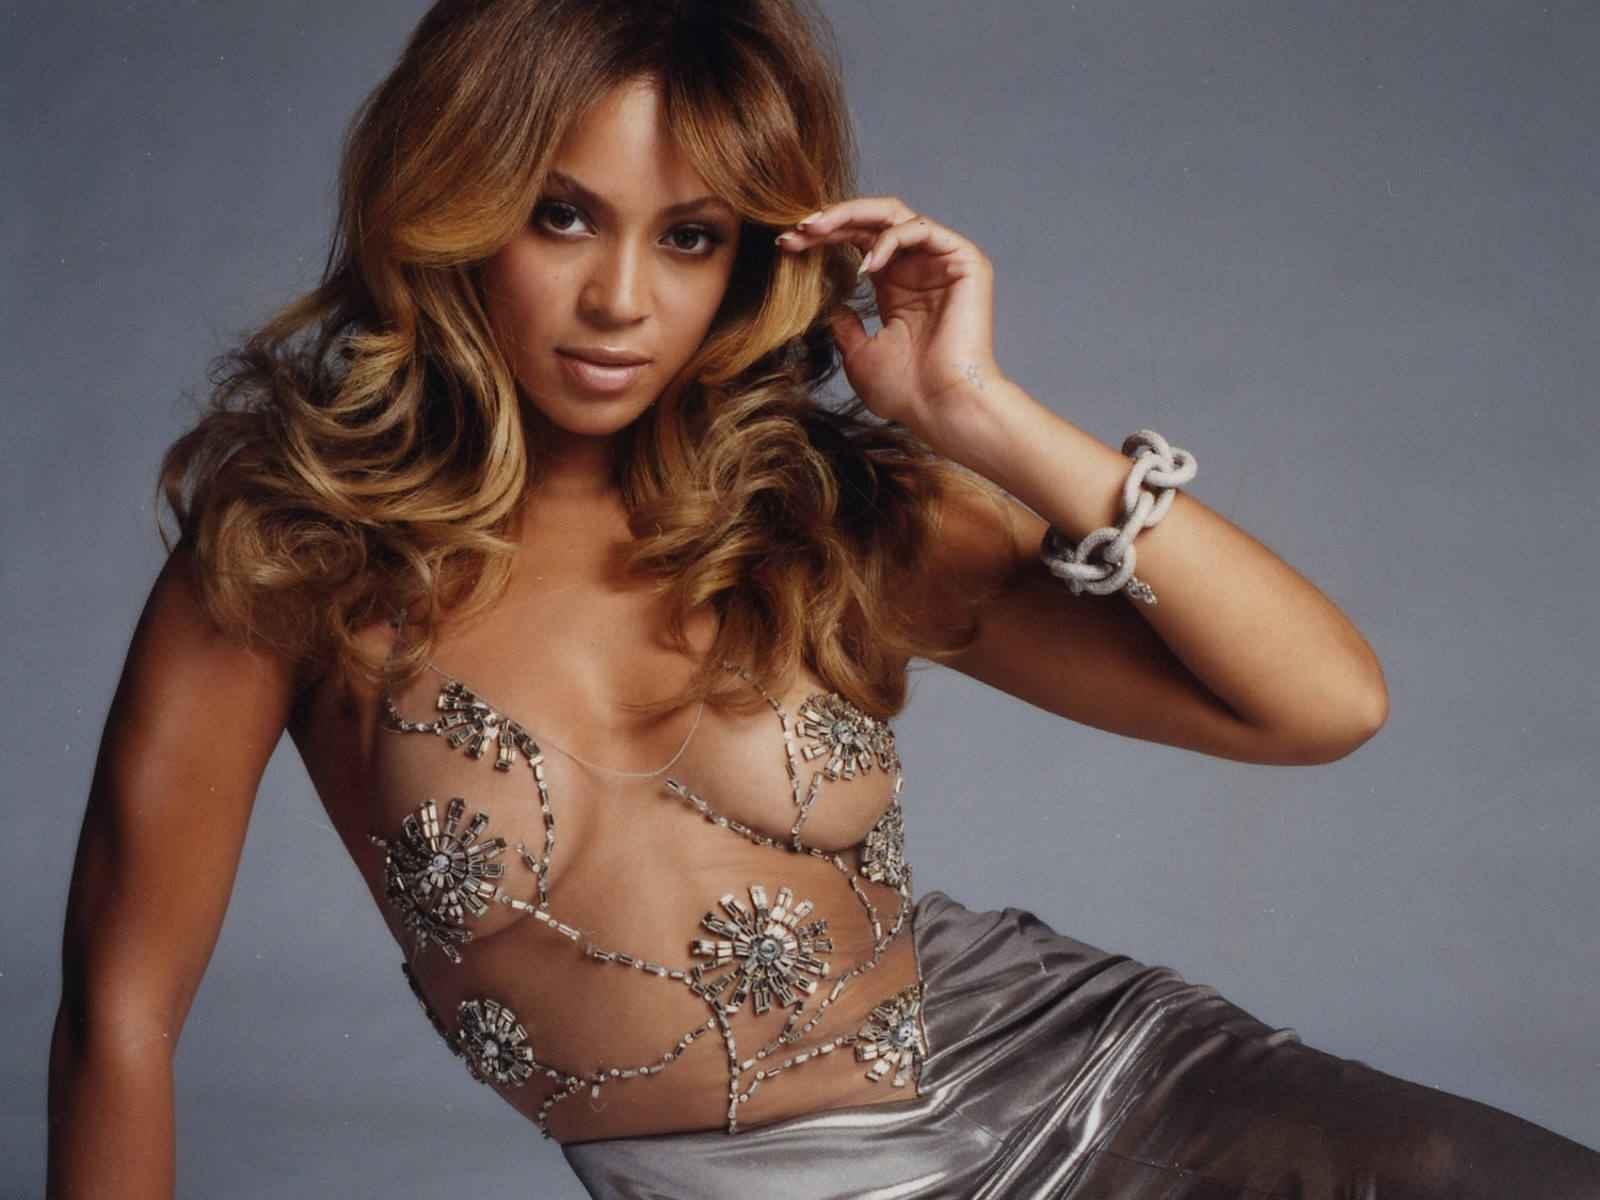 http://2.bp.blogspot.com/-U6SzMCt38gY/ThfHZRh_yEI/AAAAAAAABBA/GT_0BmBcXTs/s1600/Beyonce_Knowles_148.jpg